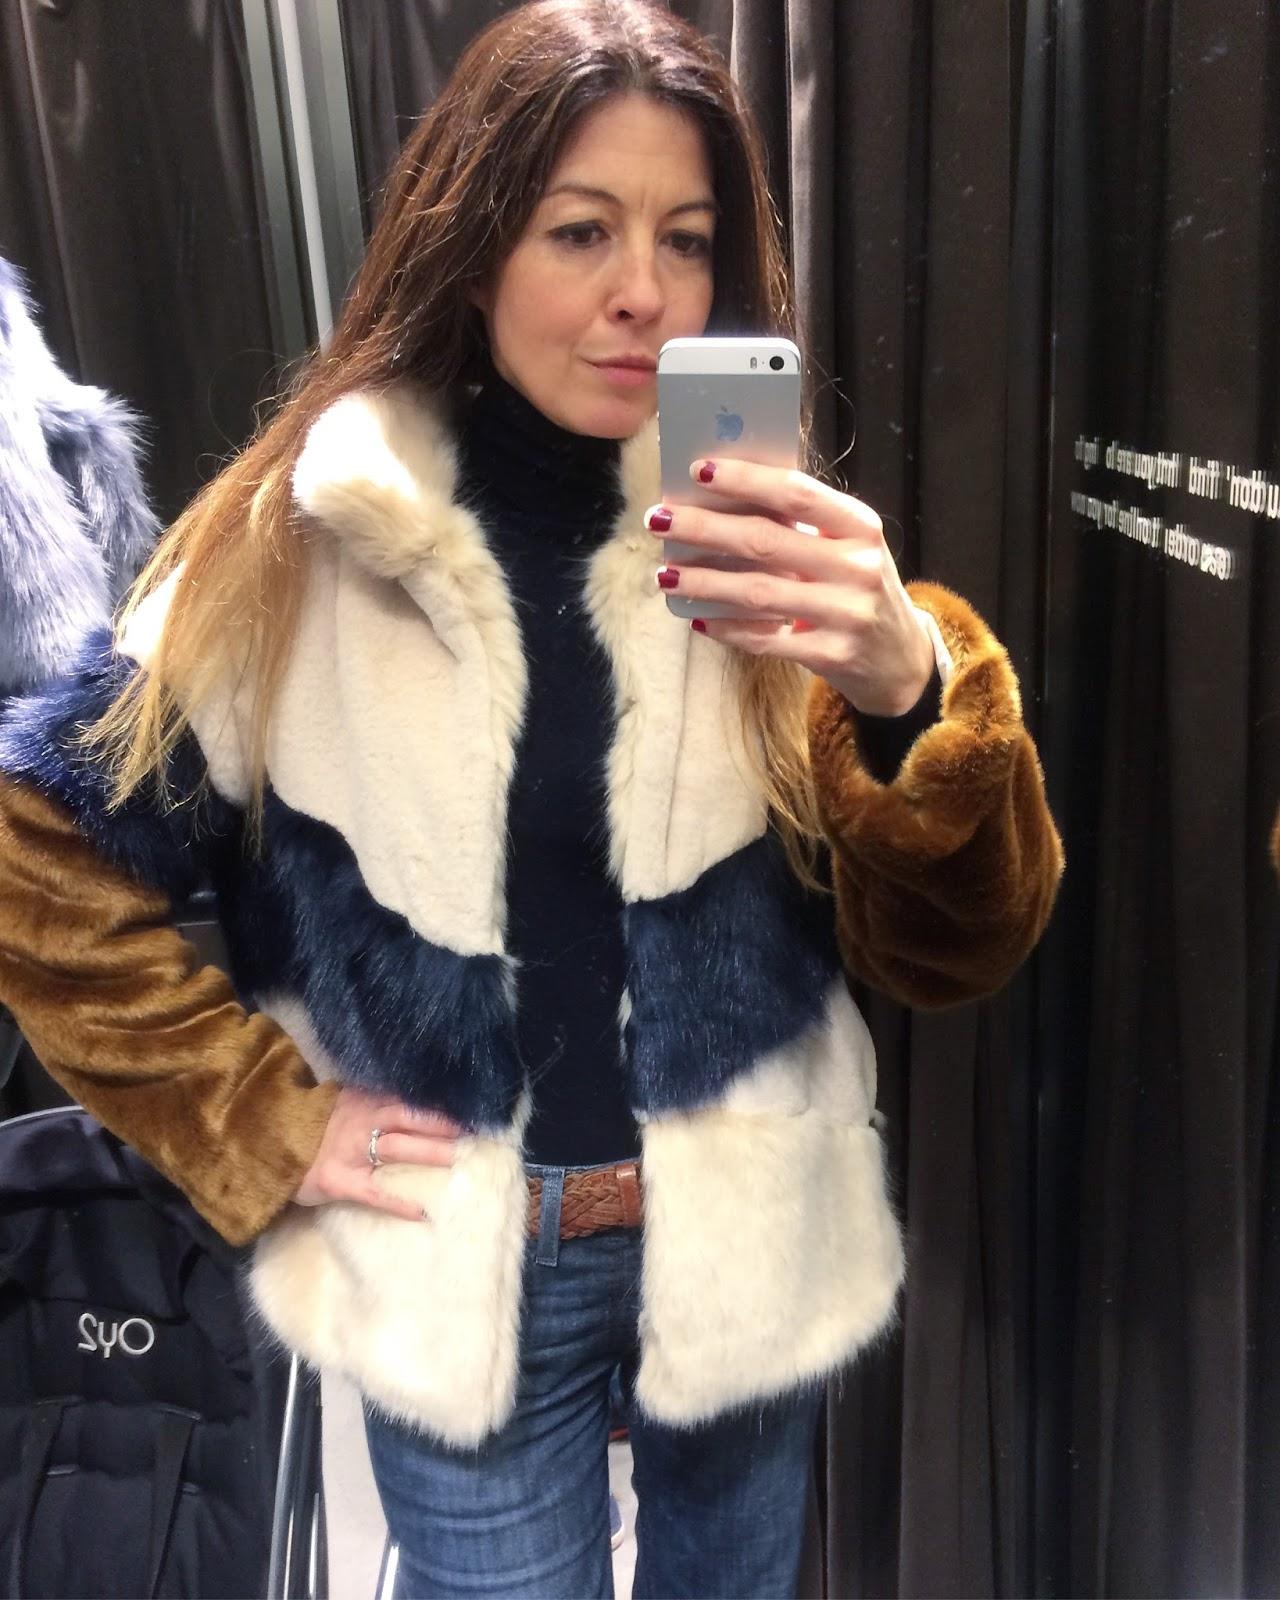 34c47a01 Both faux fur coats - Zara. Jeans - Levis. Purple boots - Zara